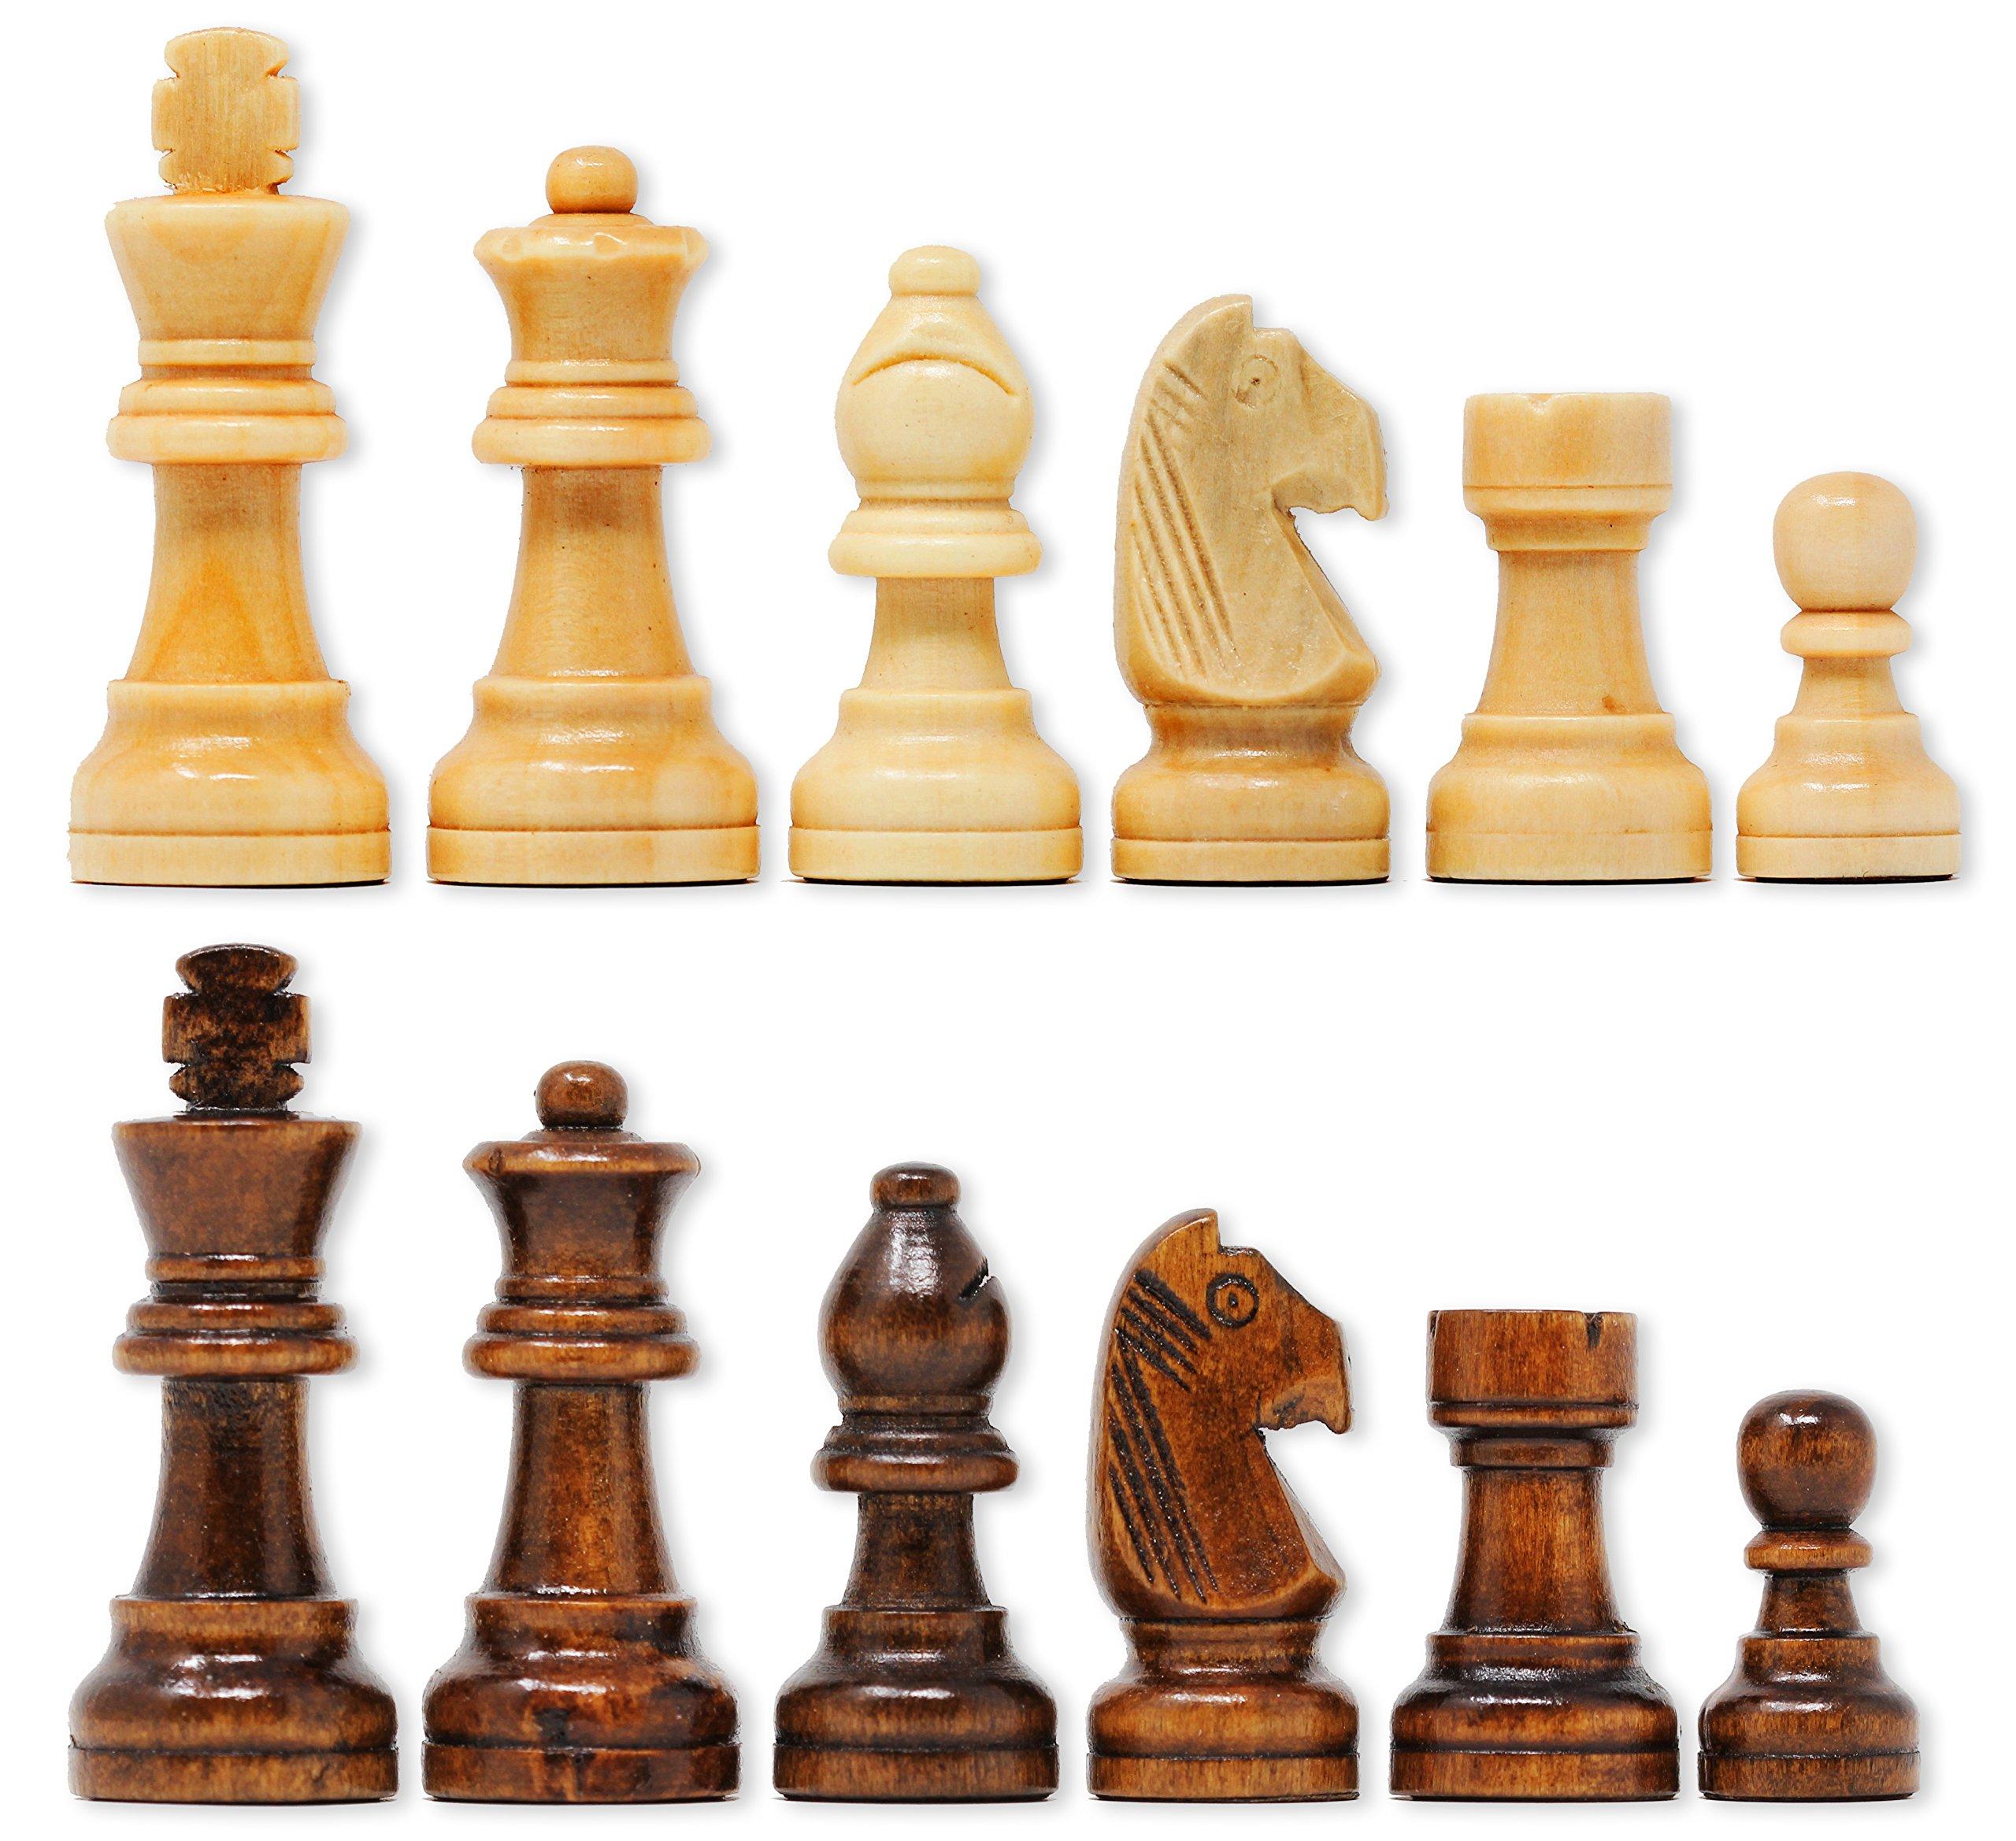 Da Vinci Staunton Wood Chess Pieces (32 Chessmen) & Storage Bag … (3 Inch King) by DaVinci (Image #2)